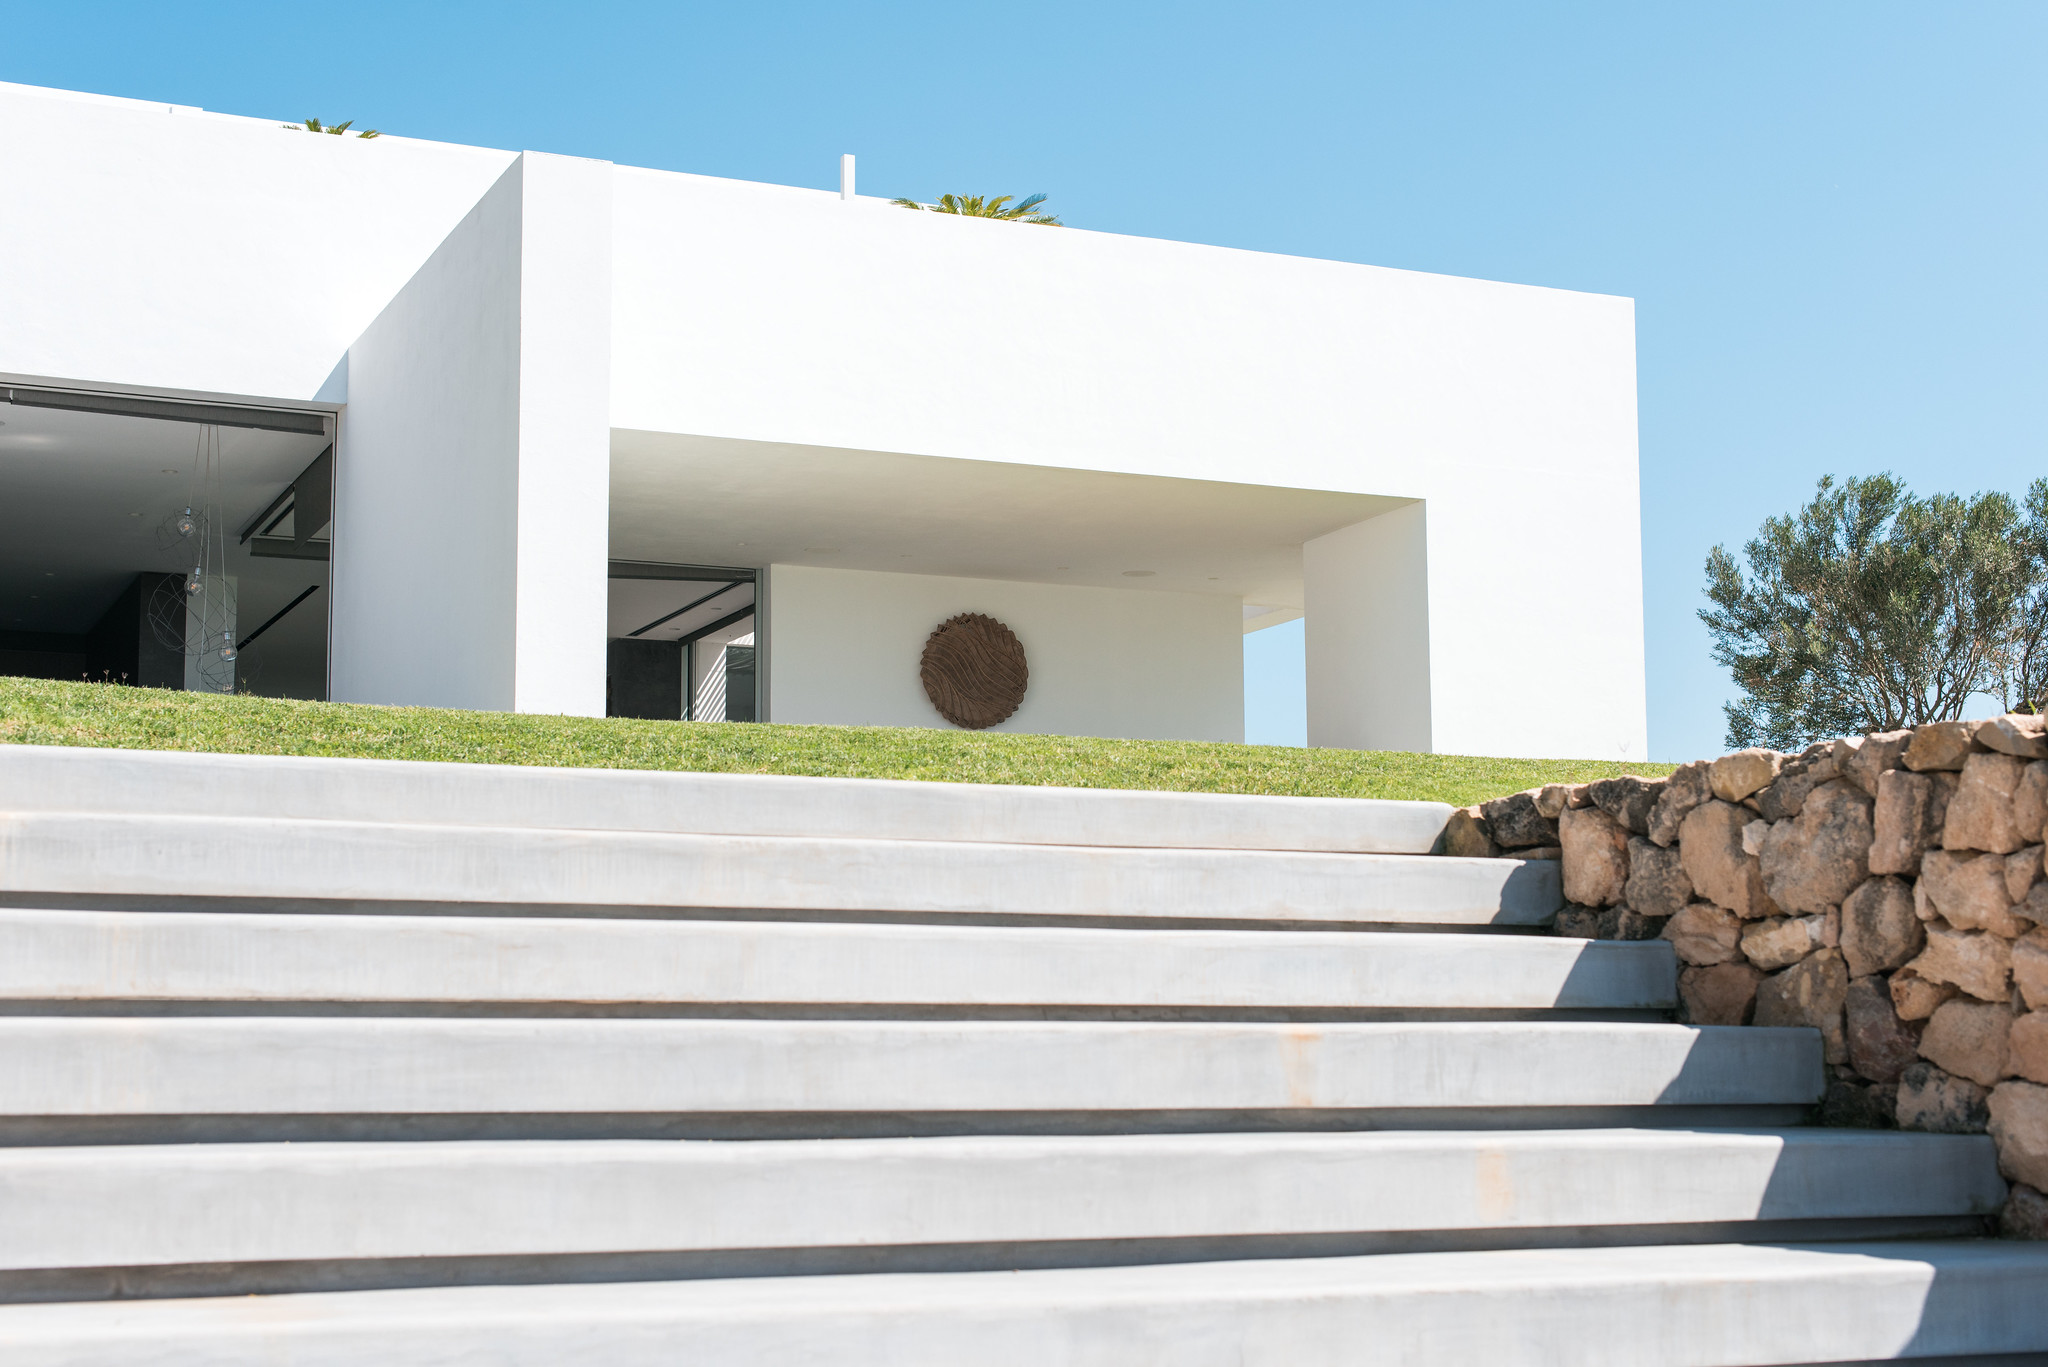 https://www.white-ibiza.com/wp-content/uploads/2020/05/white-ibiza-villas-can-zama-steps-up-from-pool.jpg